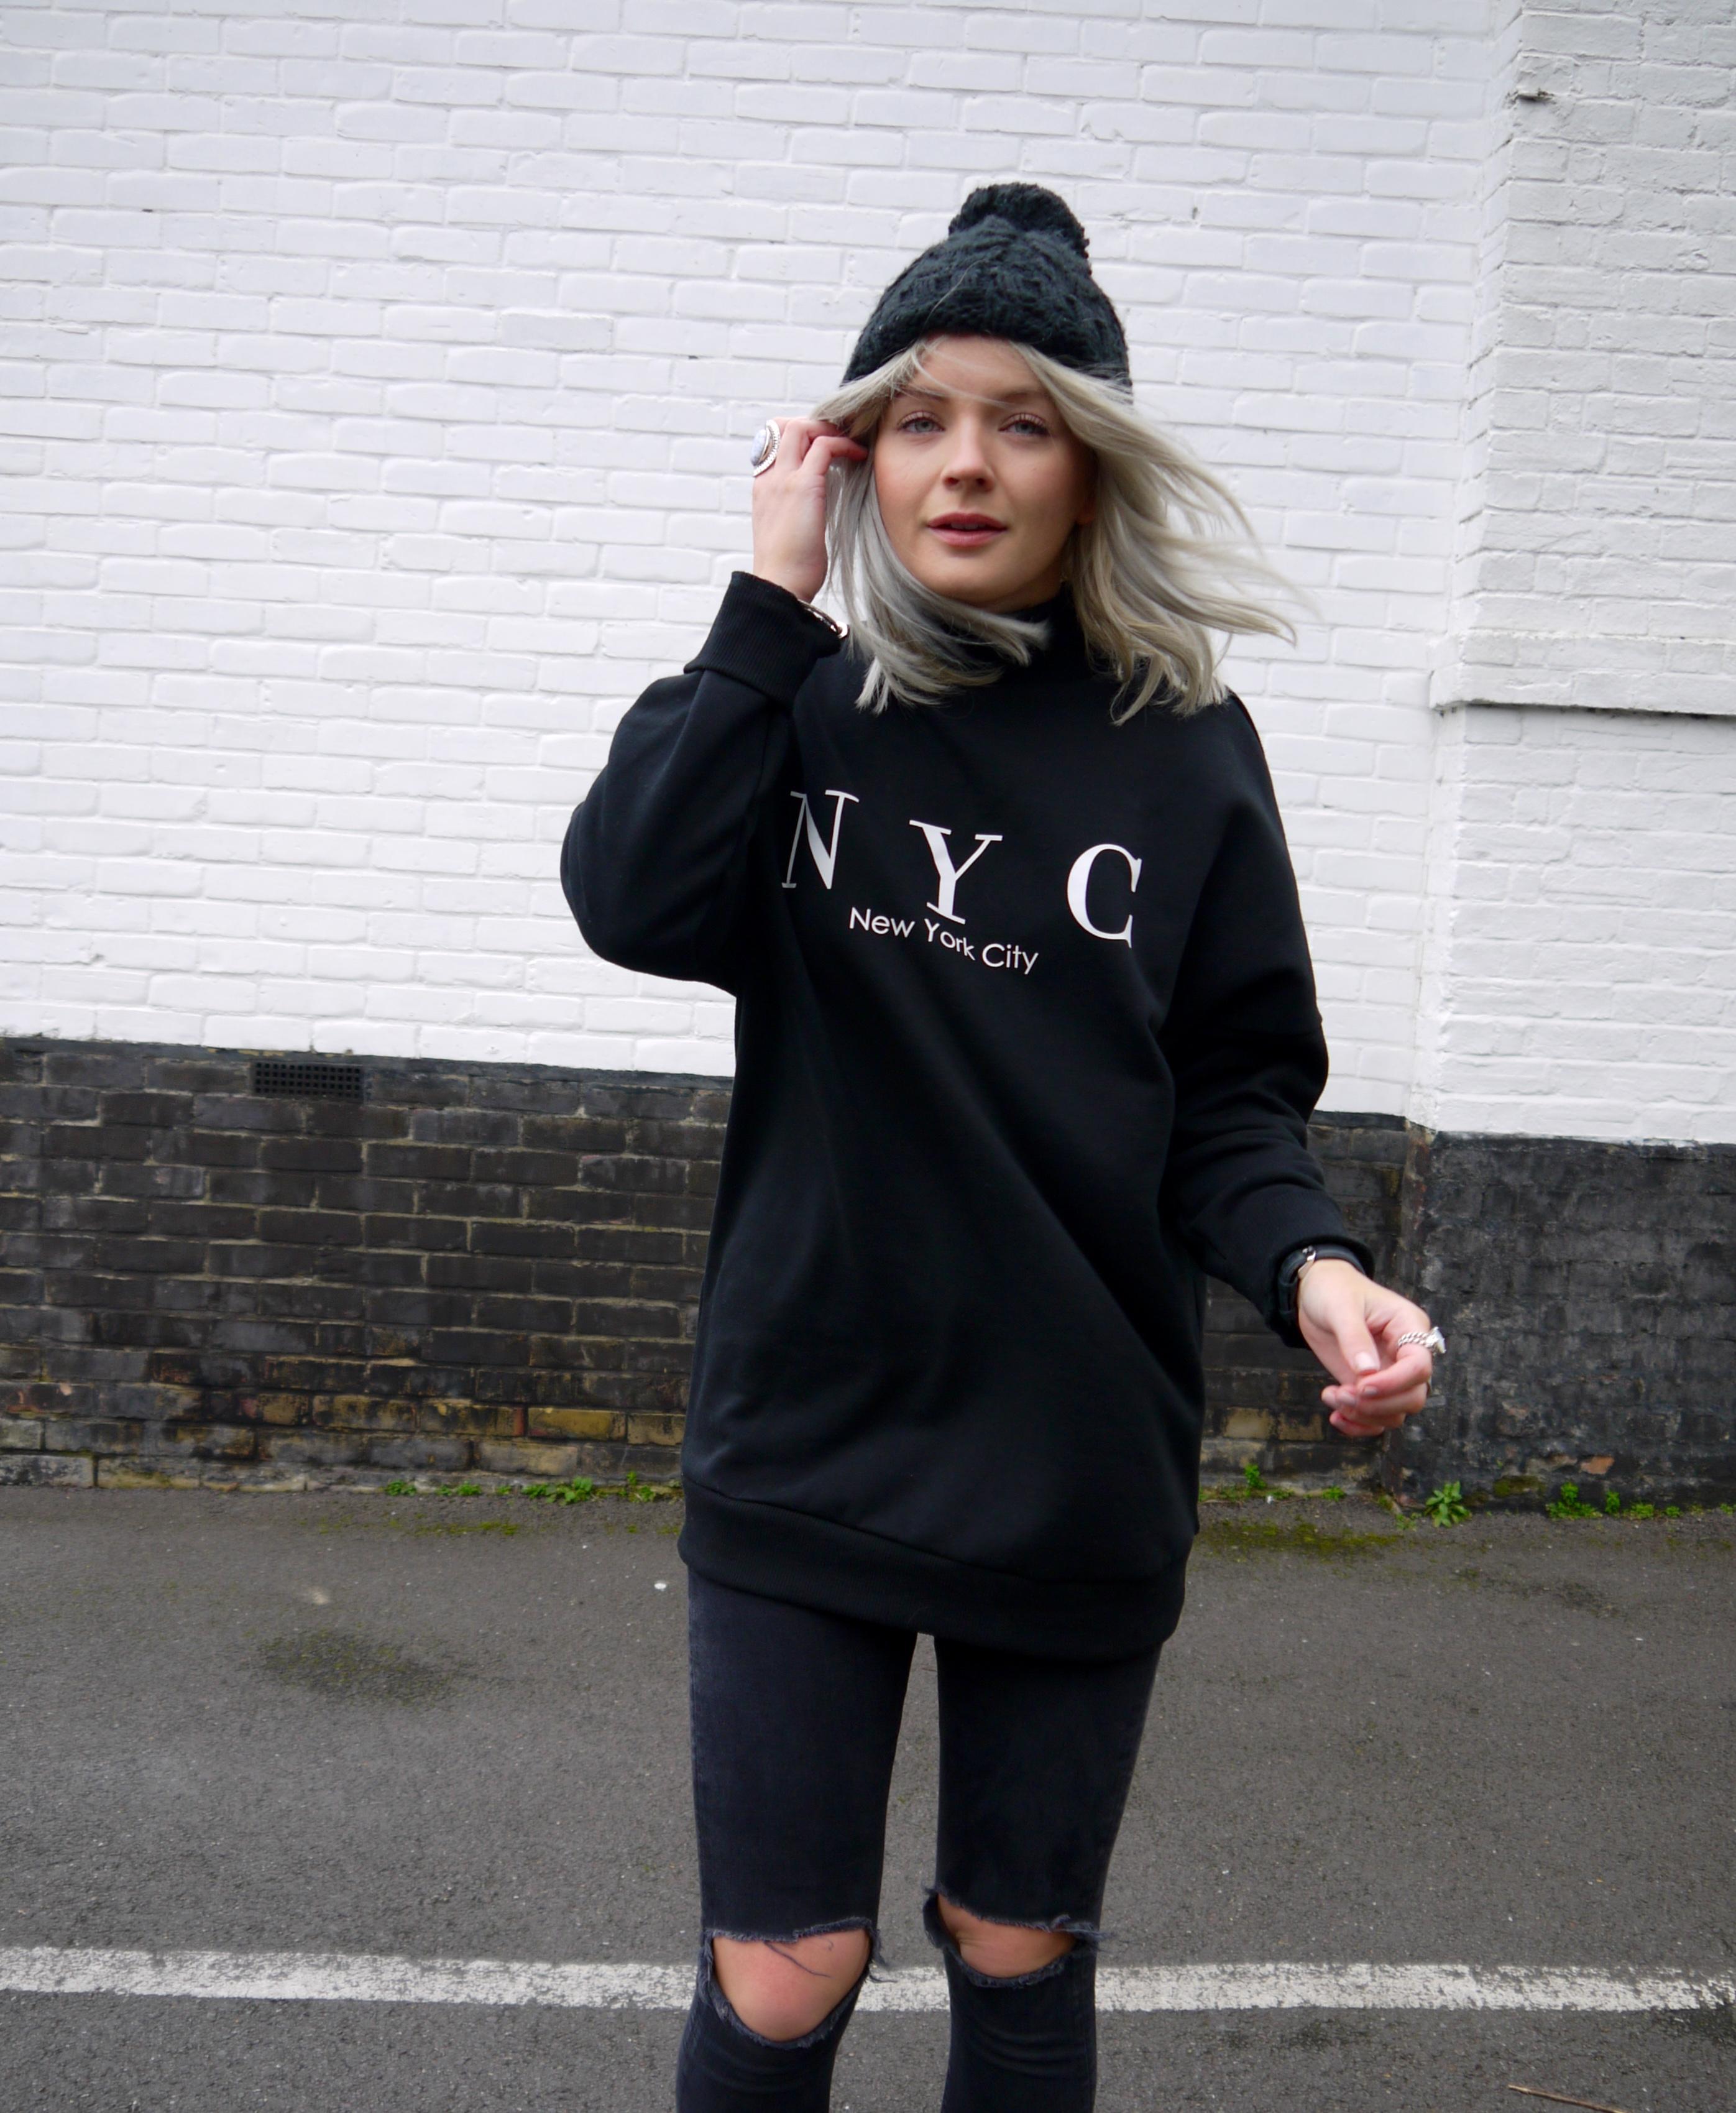 all black outfit, niece jumper, h&M black jumper, black old school vans, black bobble hat, street style, laura byrnes, lauras little locket